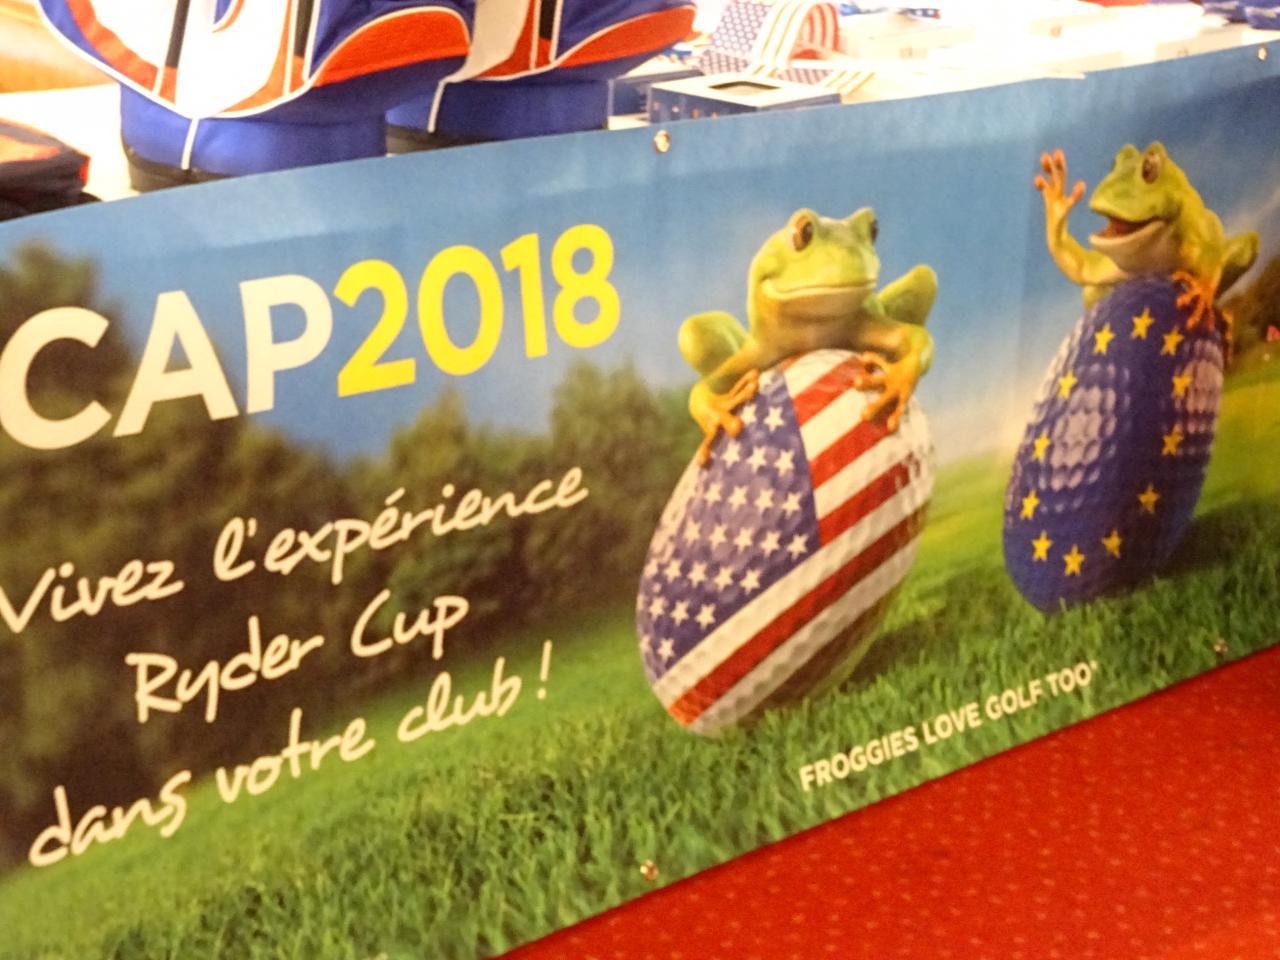 COUPE CAP 2018 03